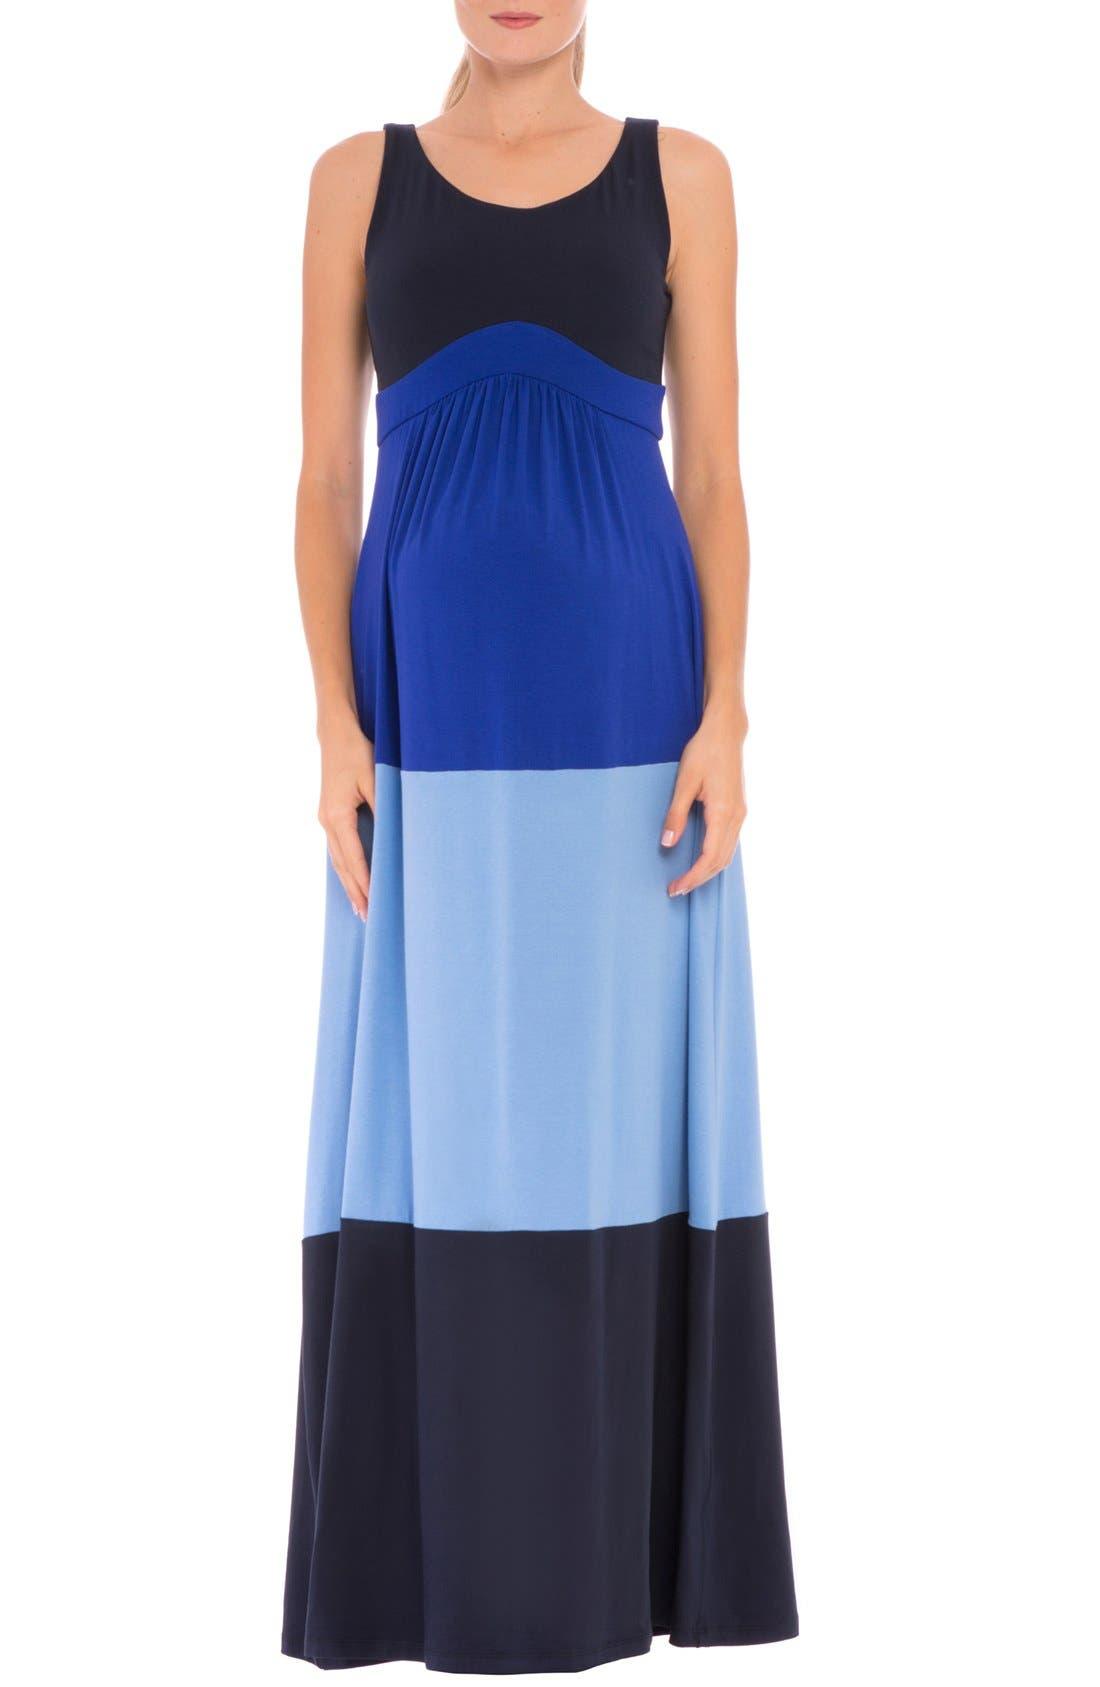 'Margarette' Colorblock Maternity Tank Dress,                             Main thumbnail 1, color,                             415